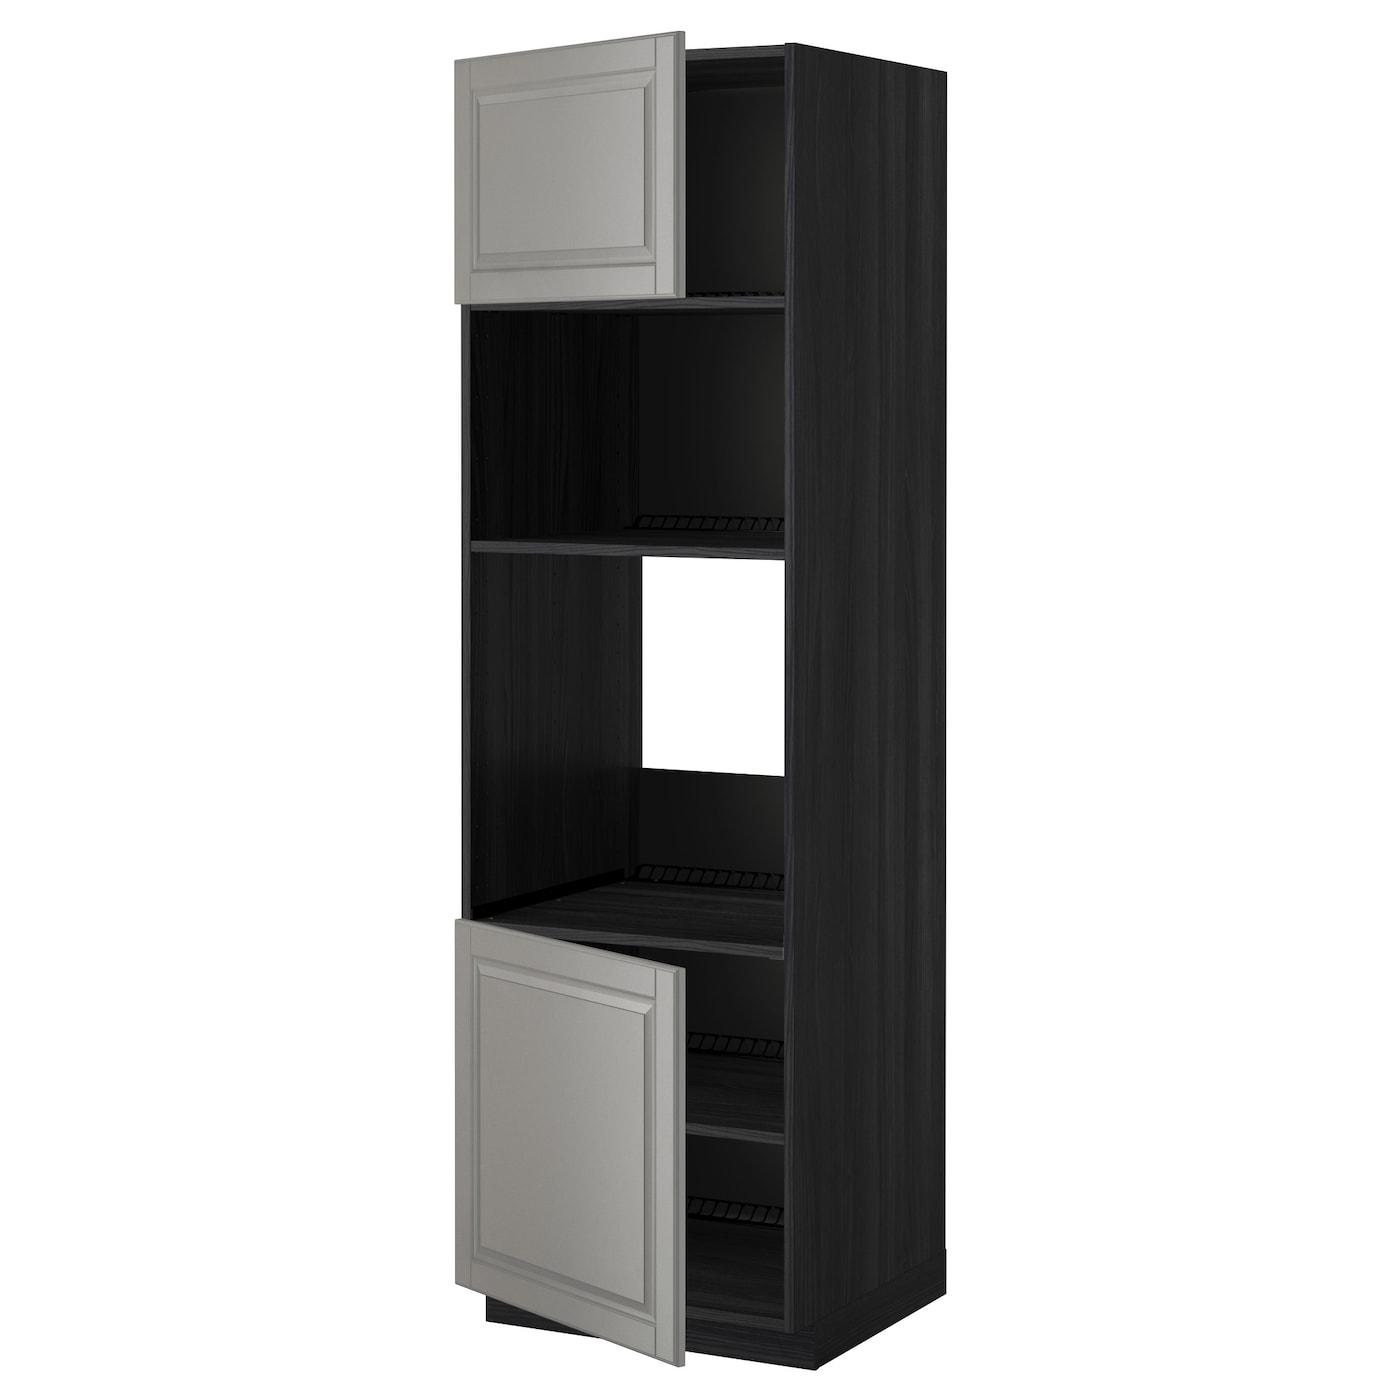 METOD Hoge kast oven/magn&2deur/plank Zwart/bodbyn grijs 60x60x200 ...